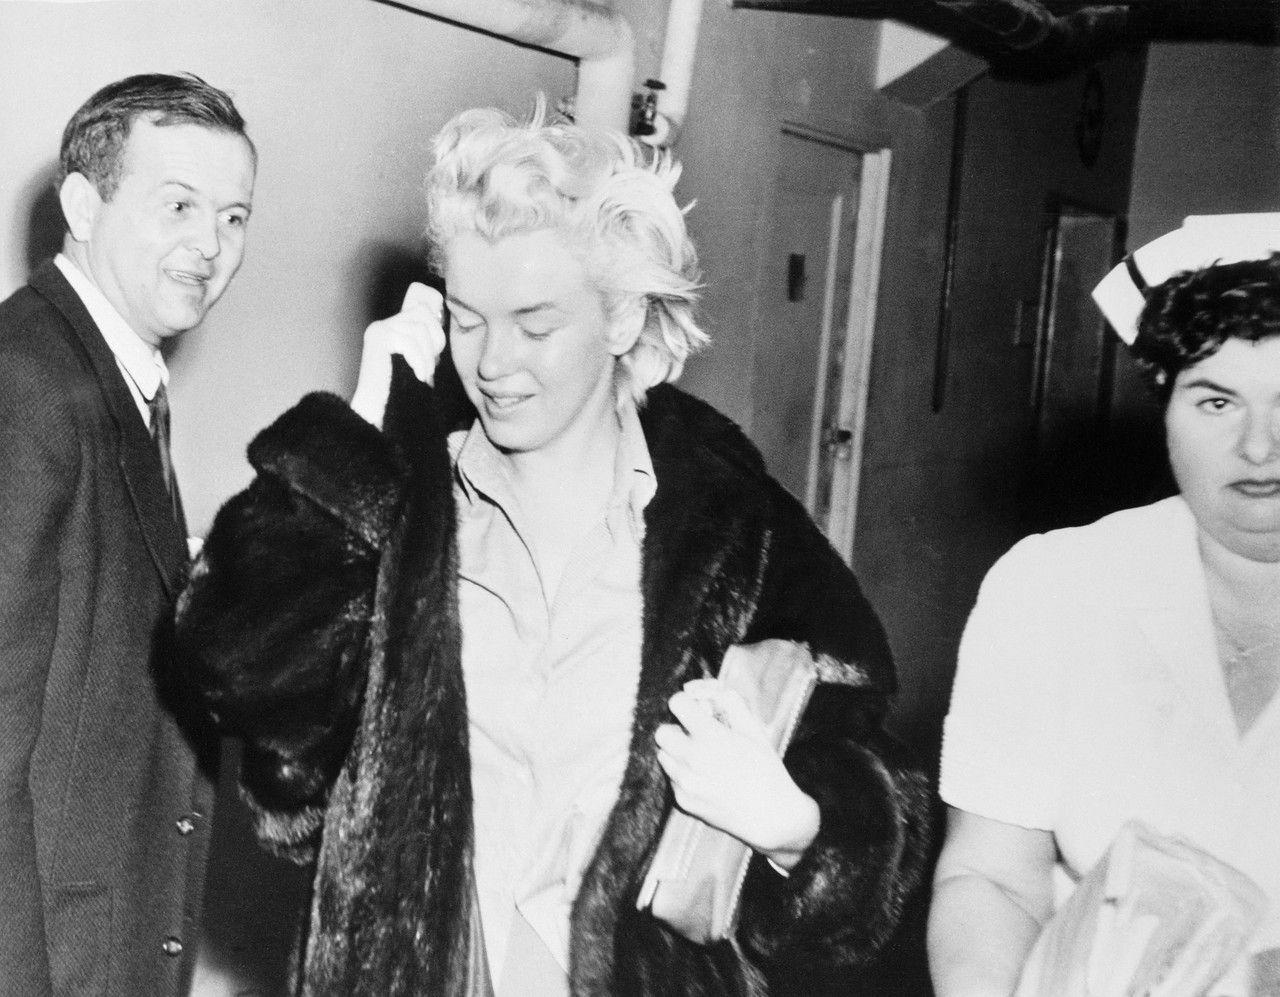 Marilyn Monroe at a psychiatric clinic